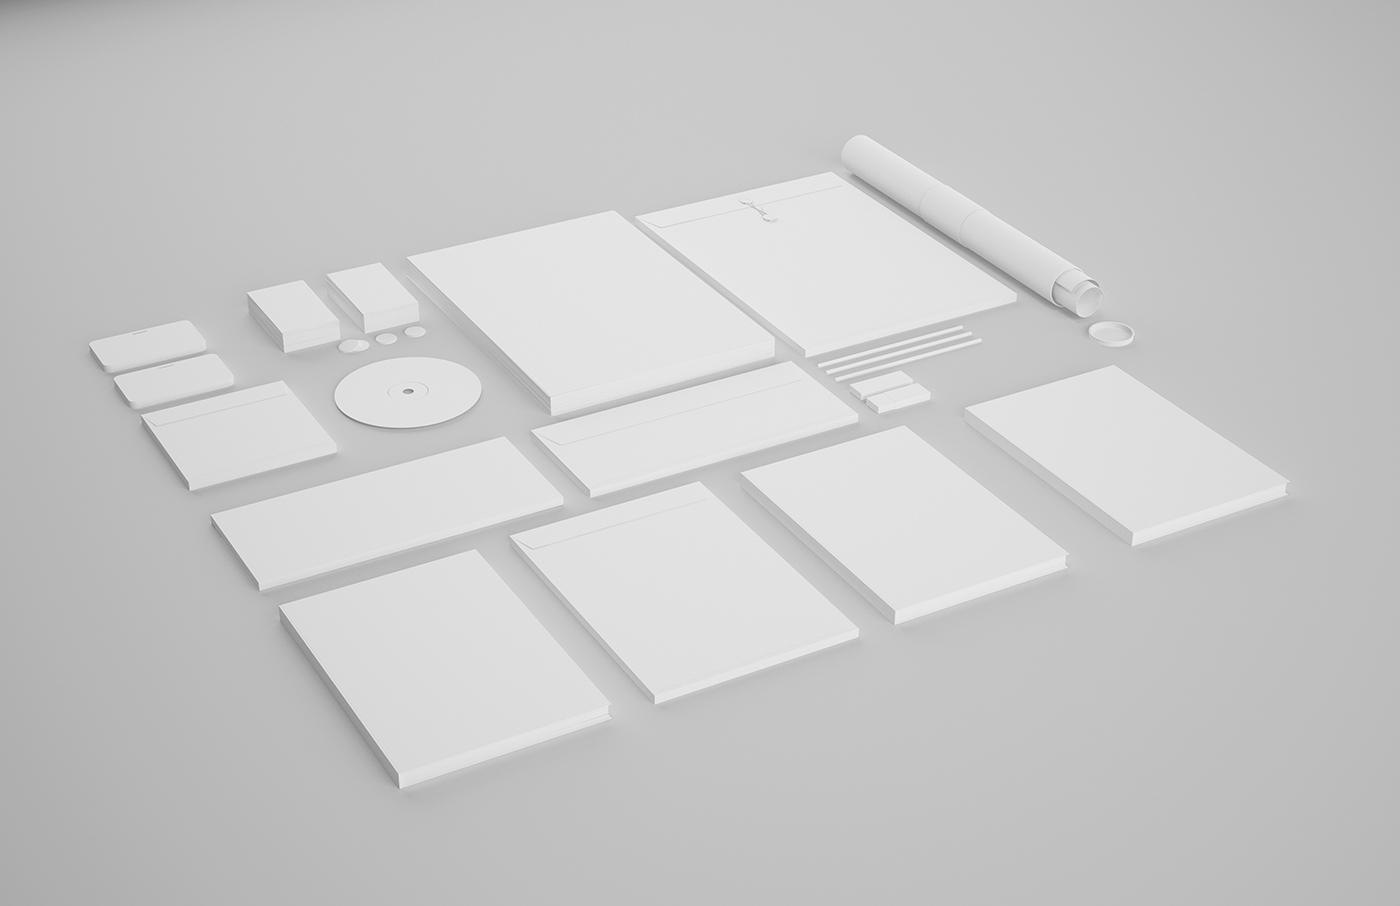 template free Stationery download corporate showcase identity logo print black minimalistic psd professional Mockup White